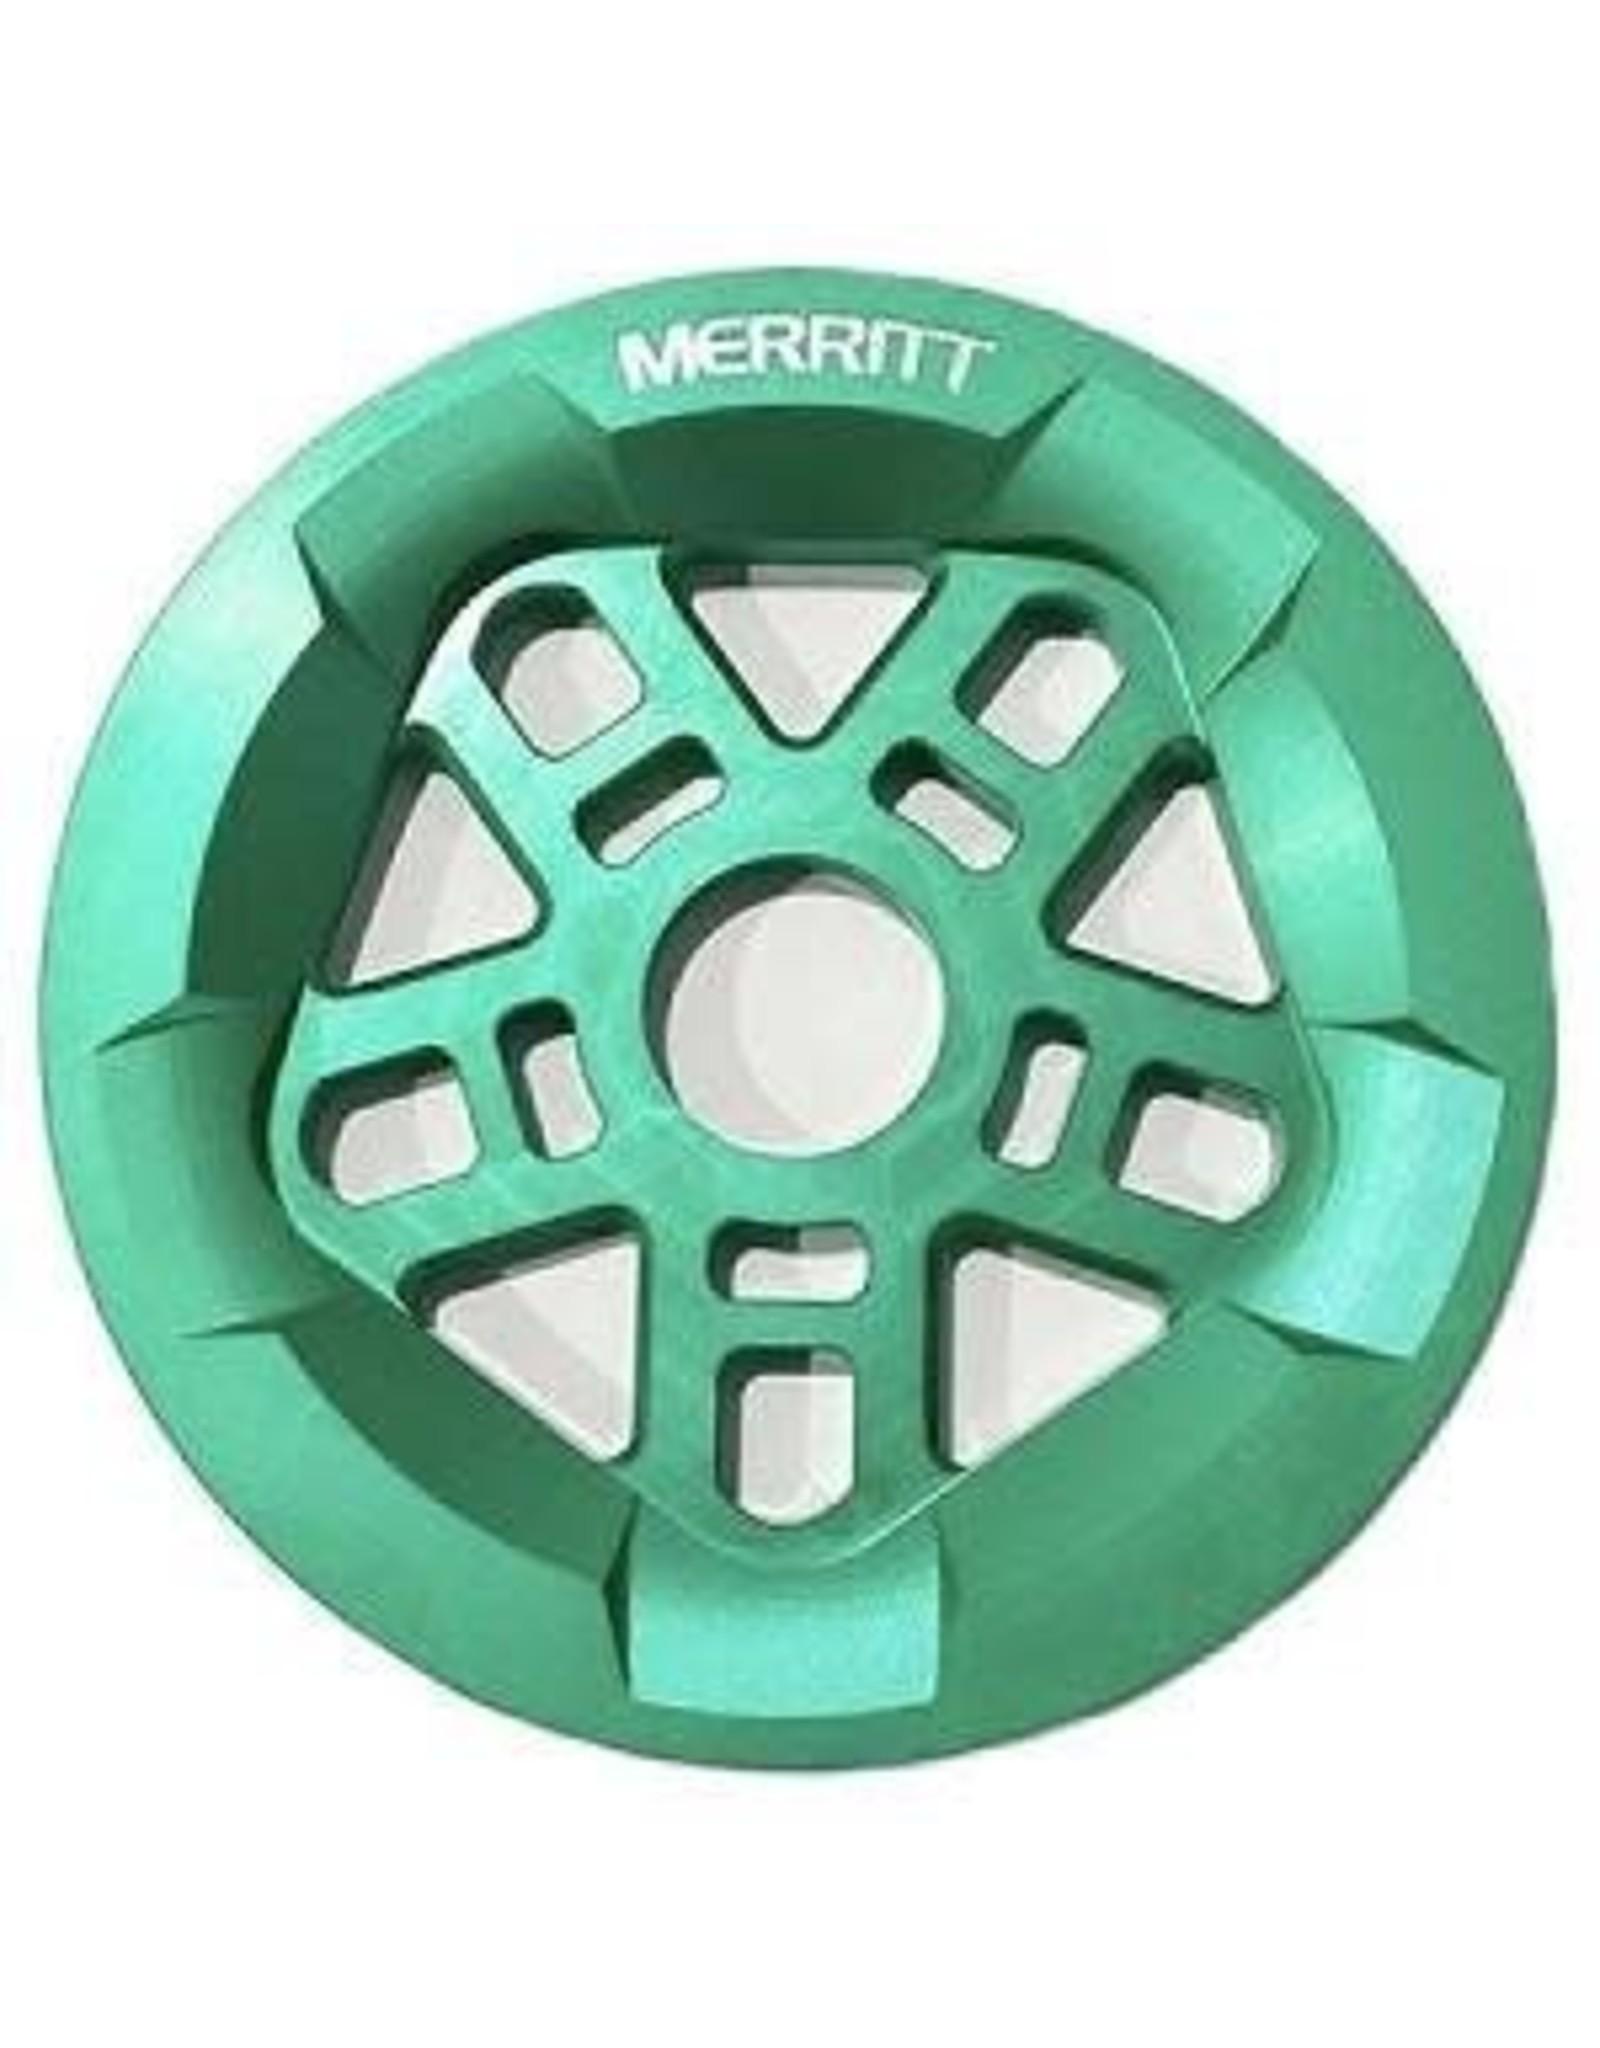 MERRITT MERRITT BEGIN GUARD SPROCKET GREEN 25T